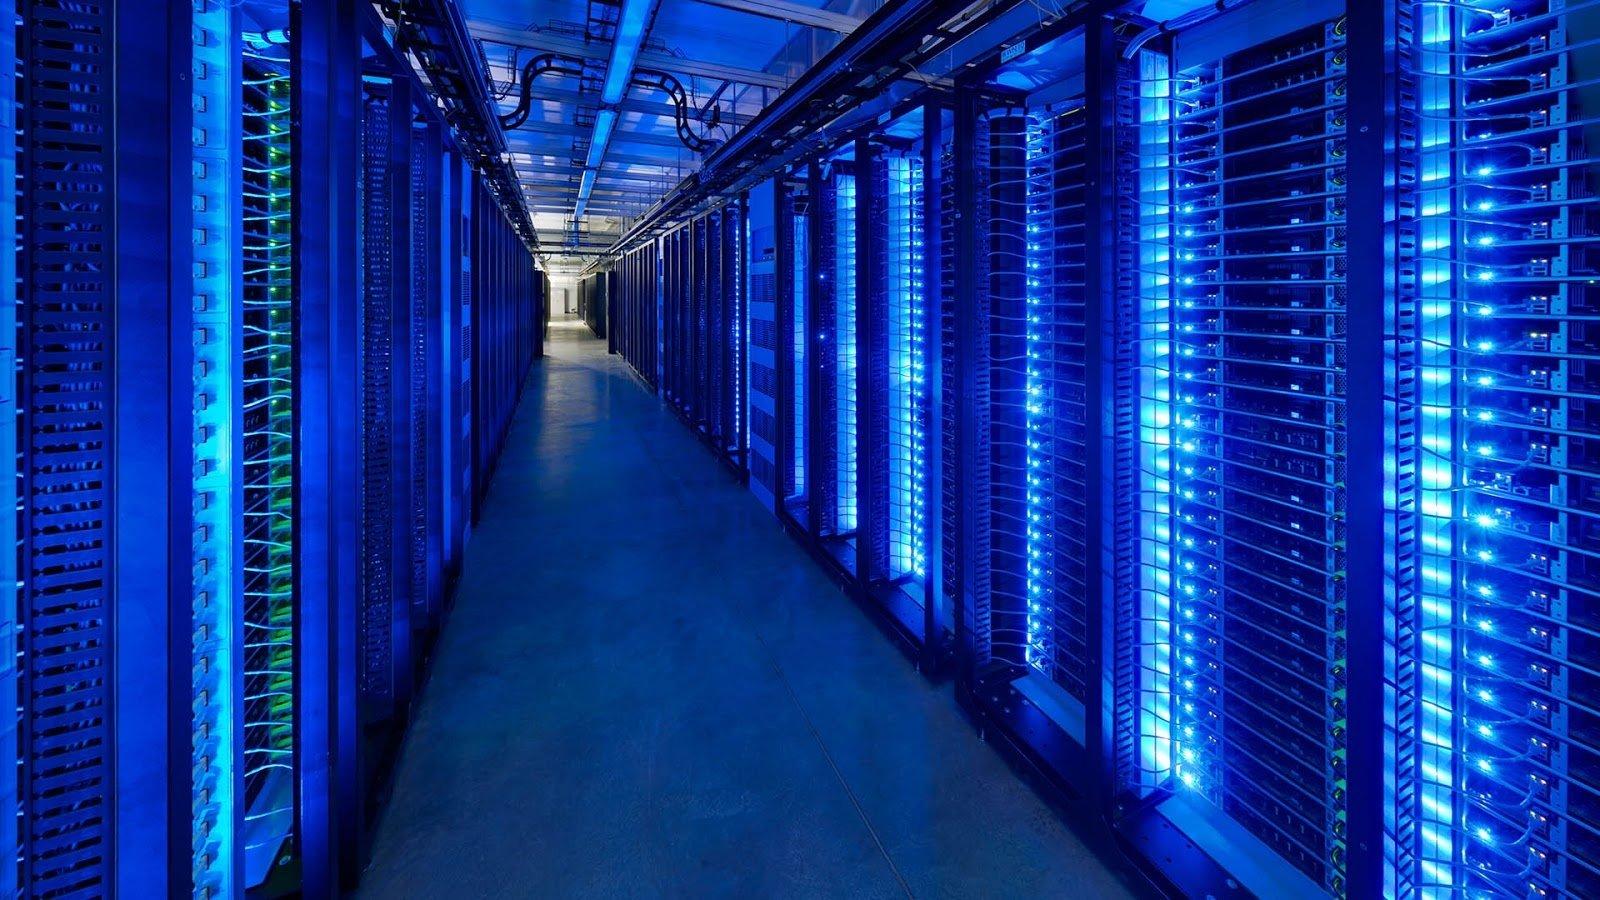 Microsoft servidores